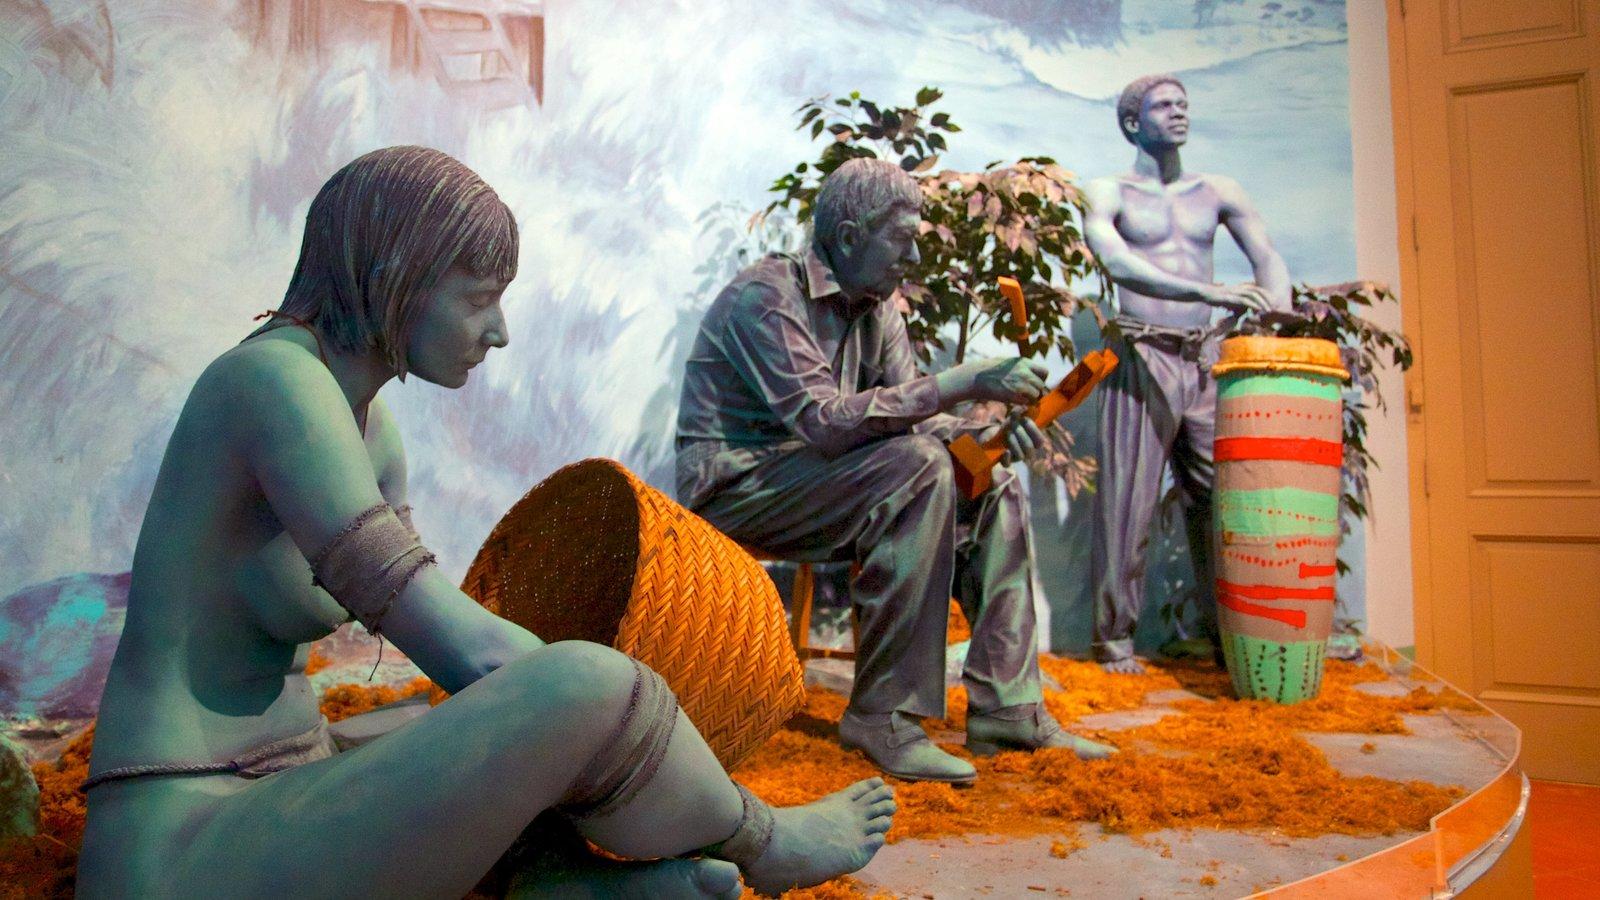 Museo de Las Americas caracterizando uma estátua ou escultura e vistas internas